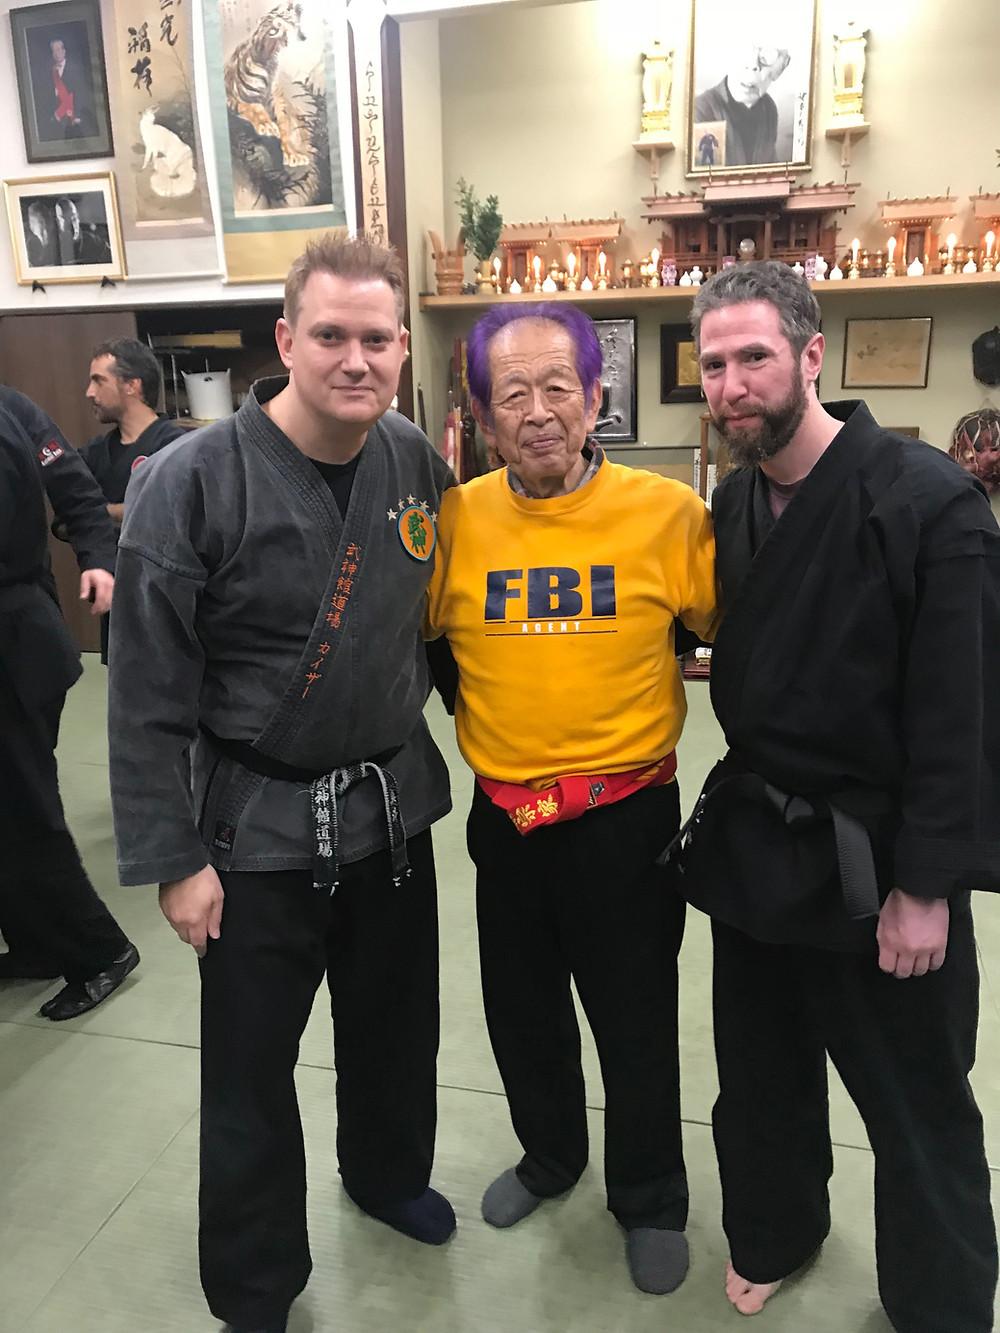 John Bibbee with Hatsumi Sensei and Matt Keiser